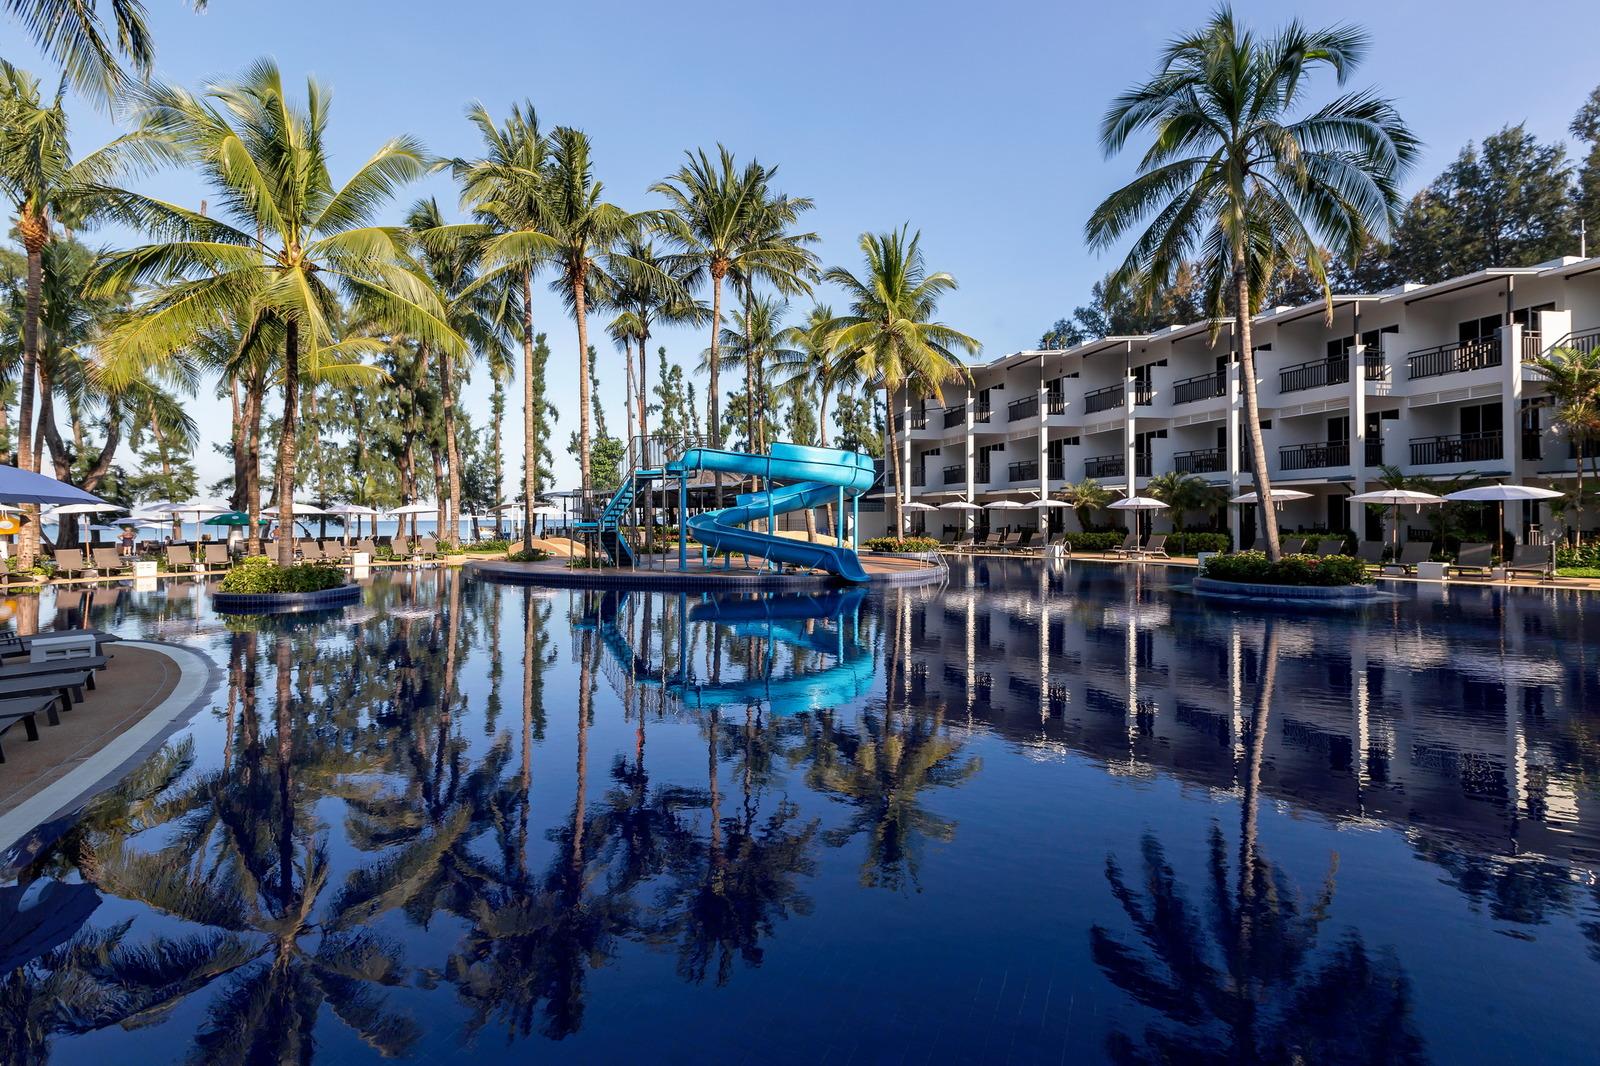 Sunwing Resort and Spa Bangtao Beach